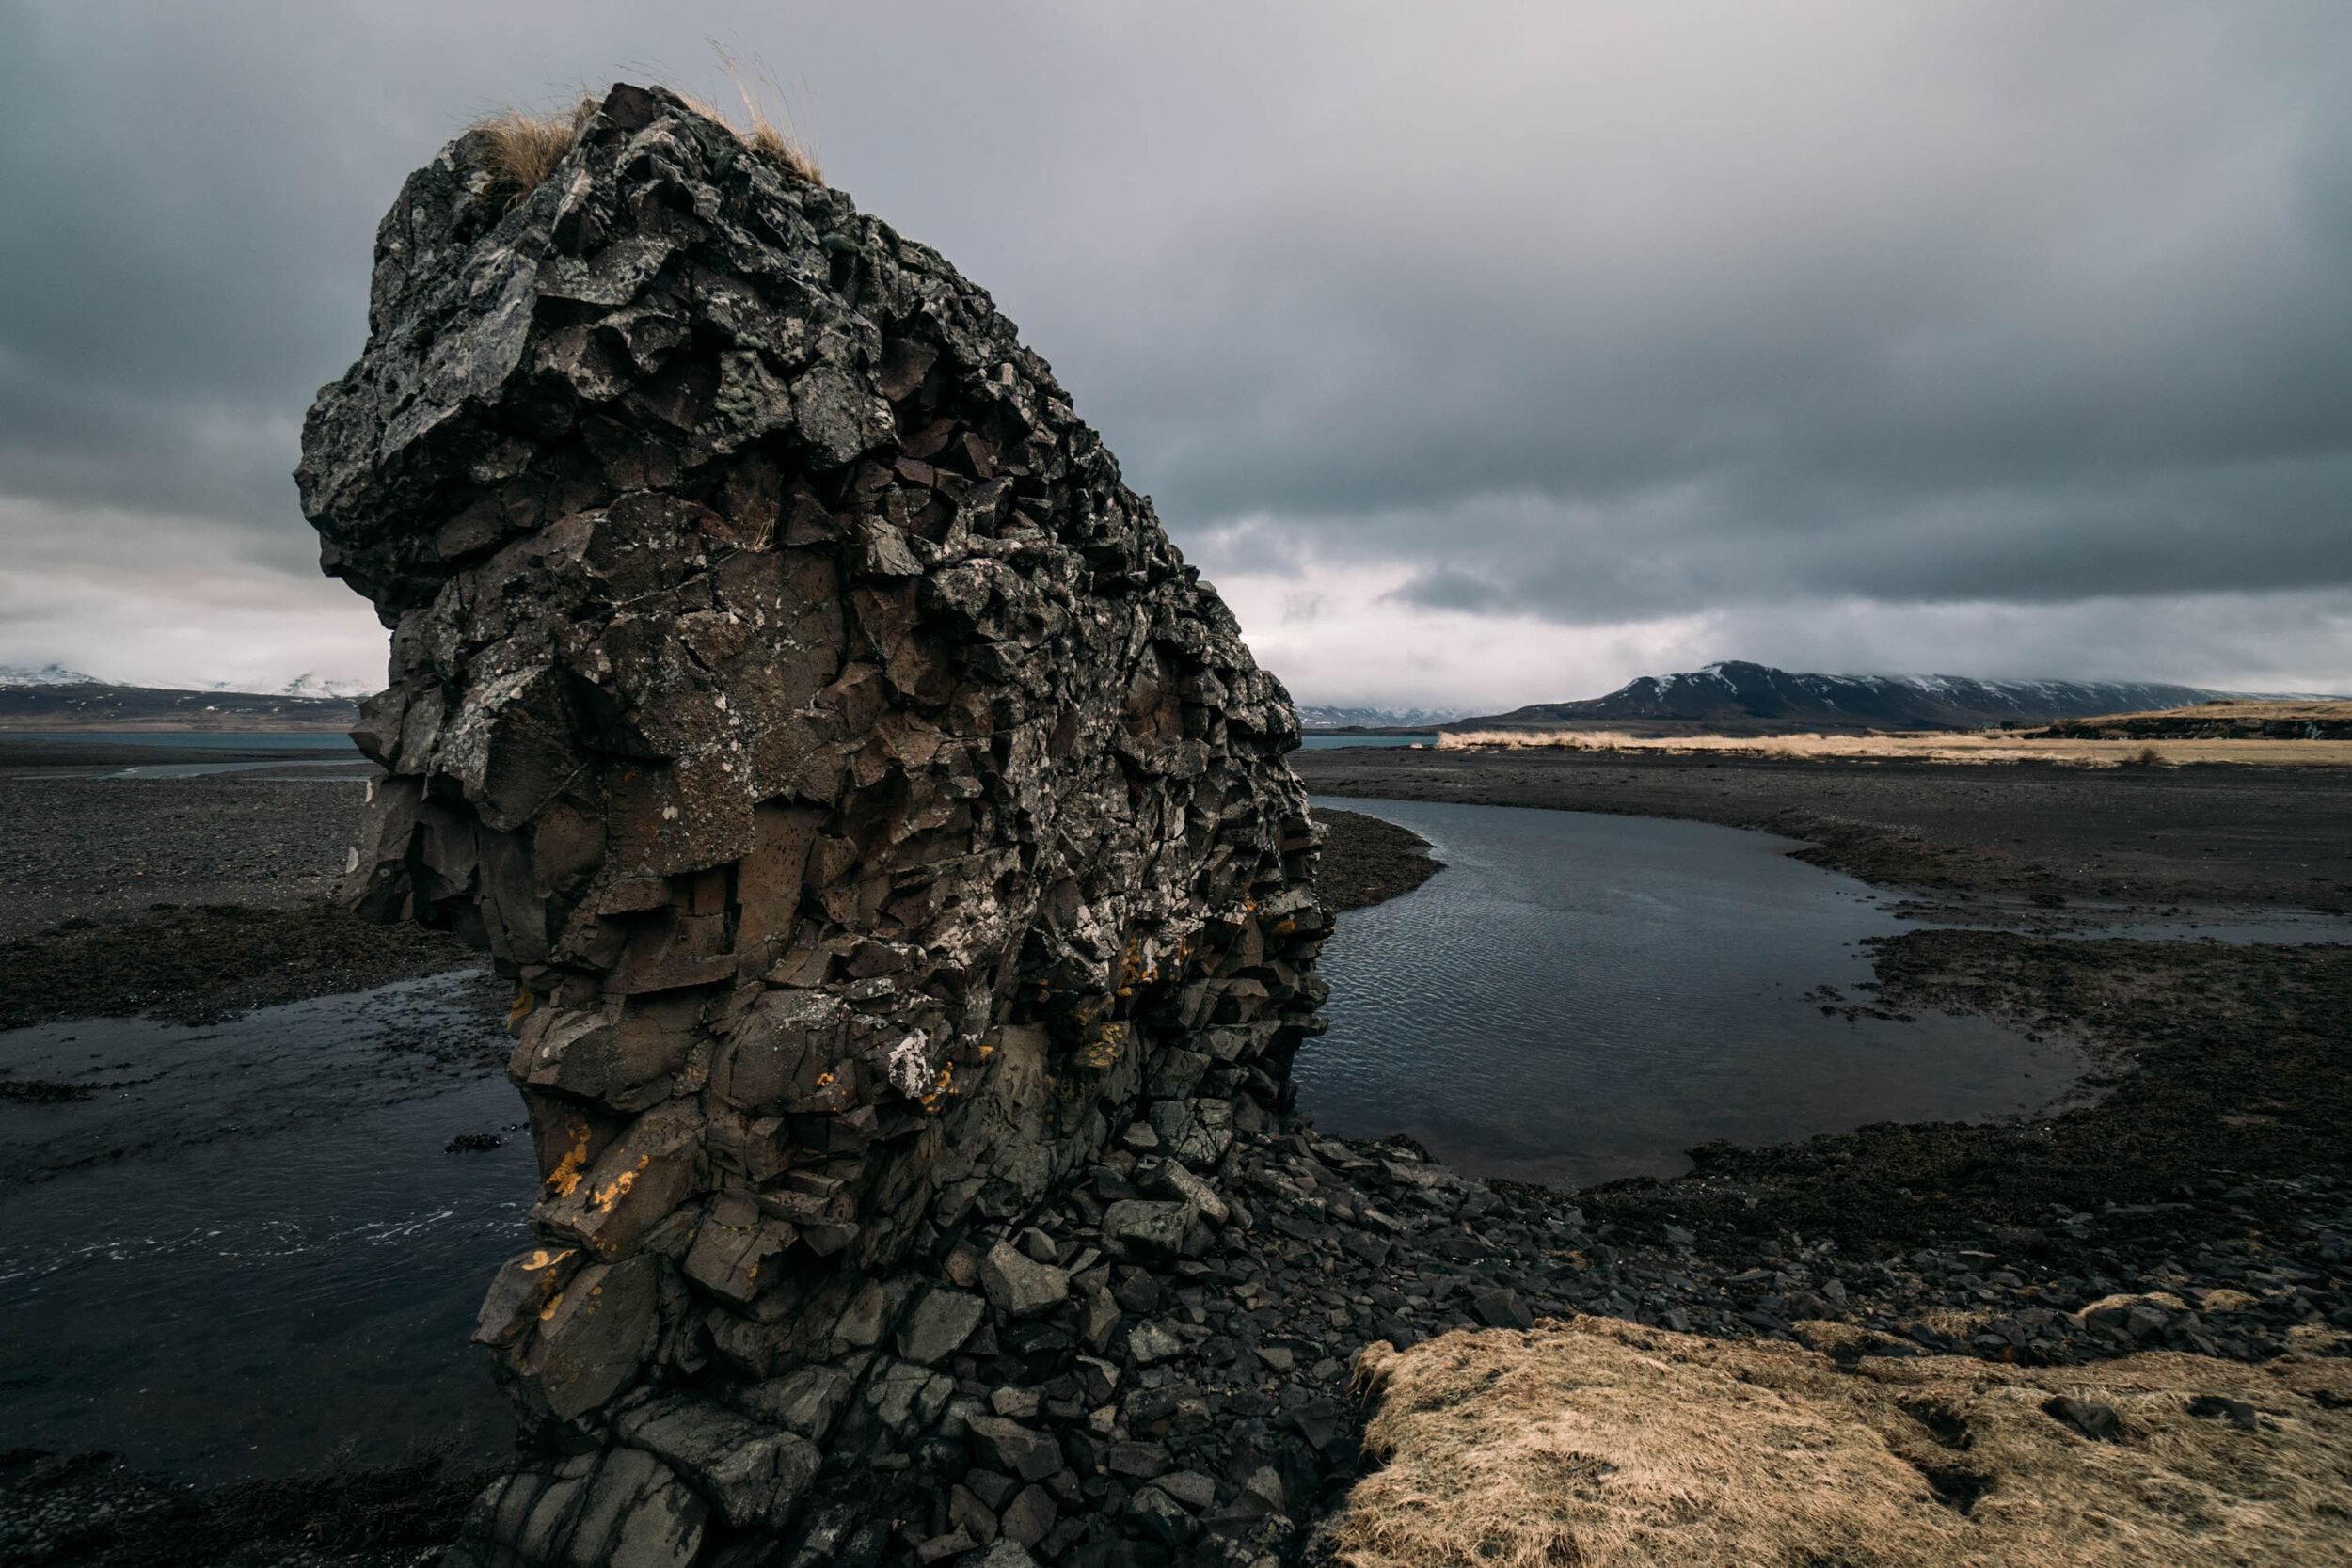 Moddy大气中深蓝色的景观,云朵滚滚而来,冰岛岩石和峡湾